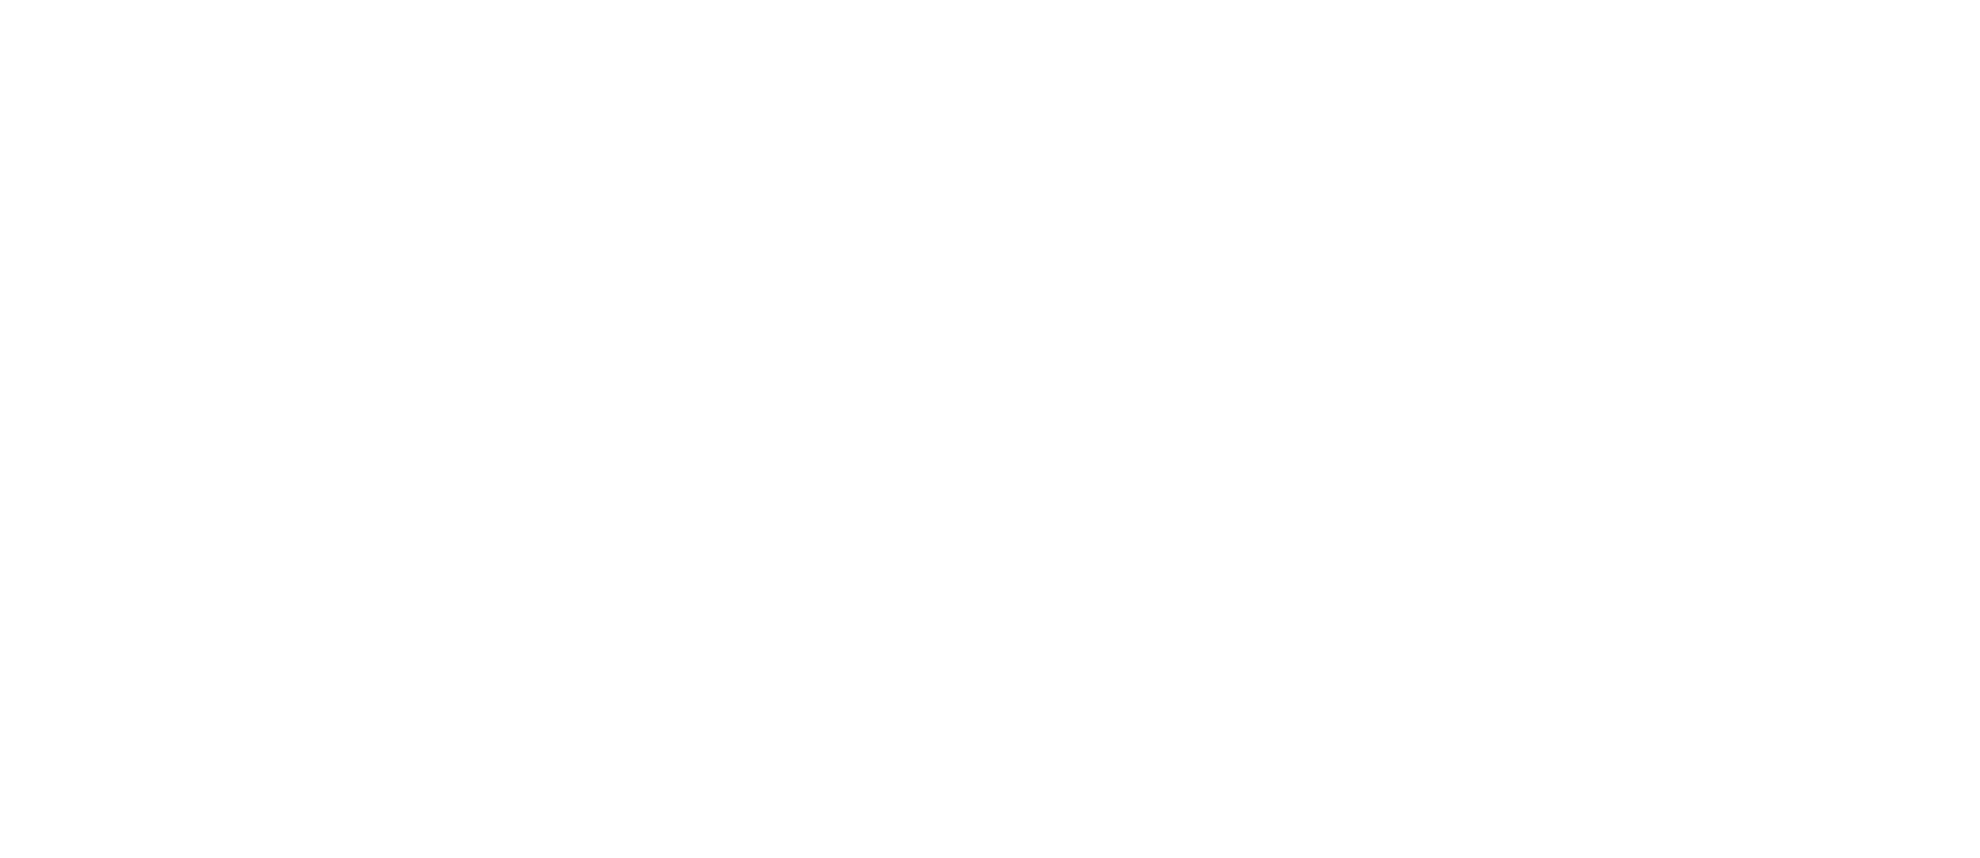 Sinistria